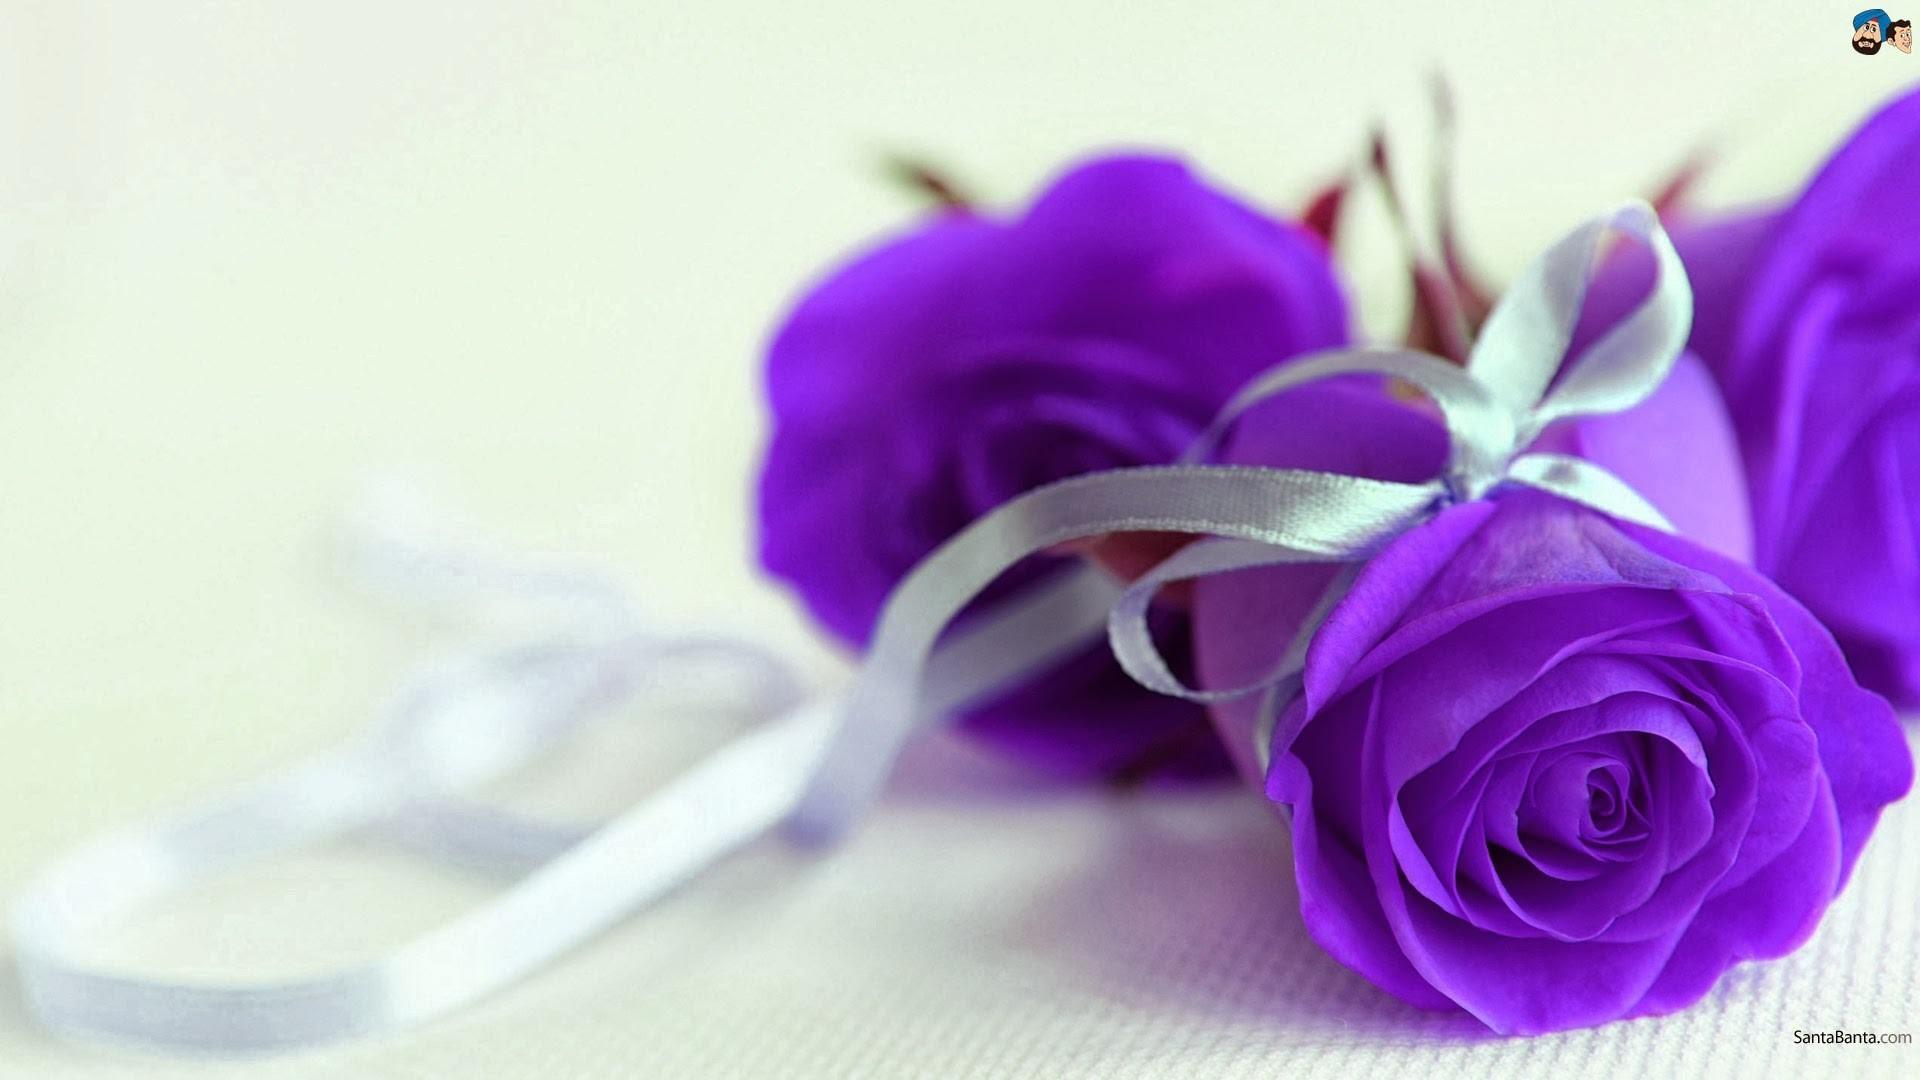 Res: 1920x1080, purple rose wallpaper hd #990460